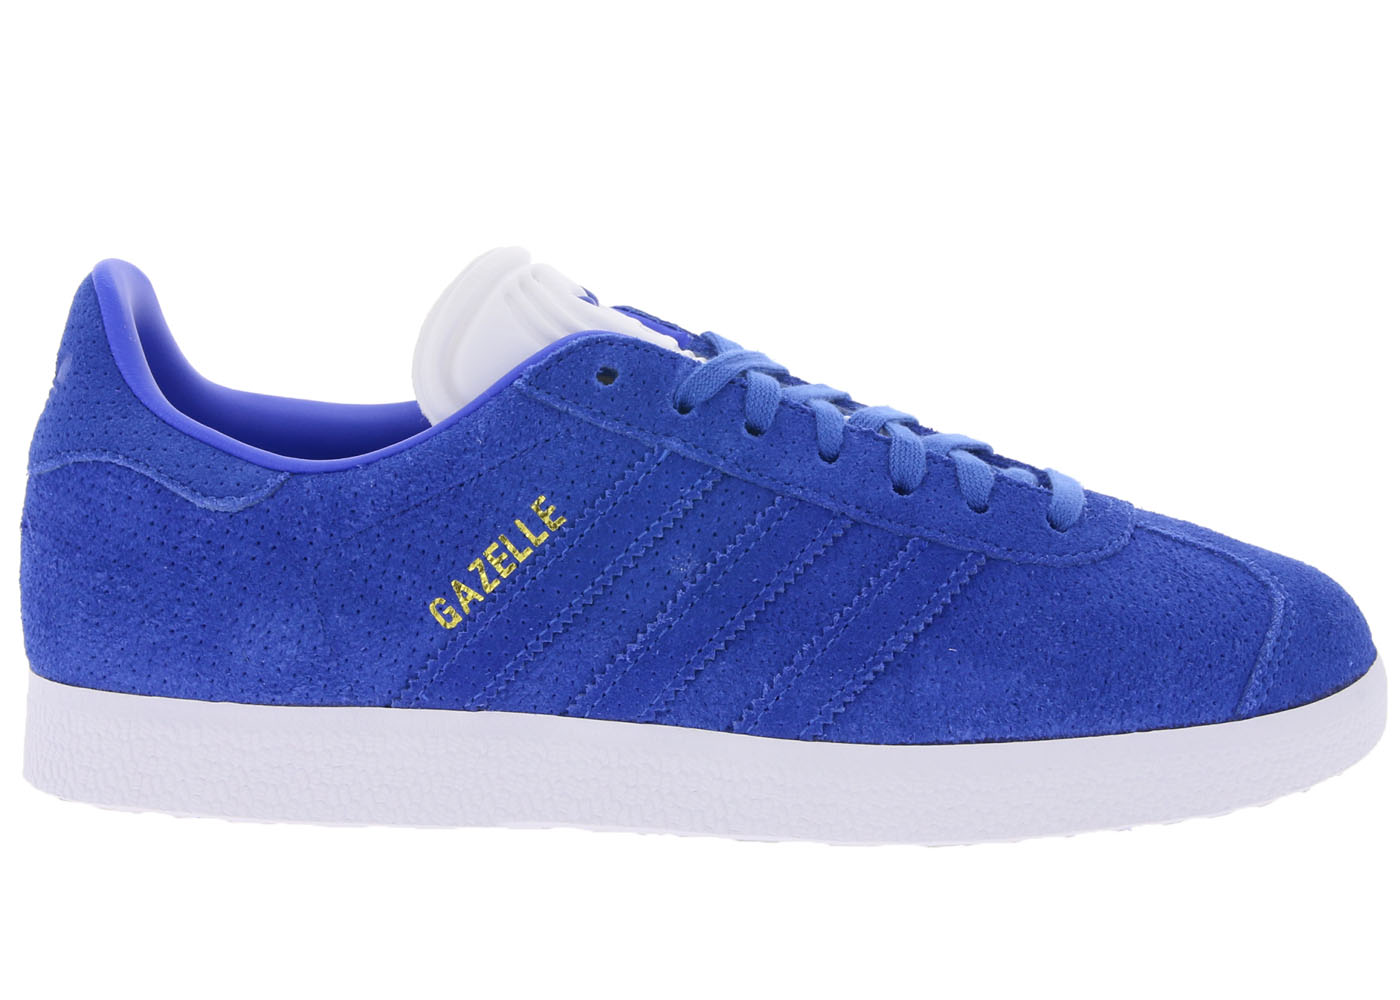 adidas gazelle blu e rosse